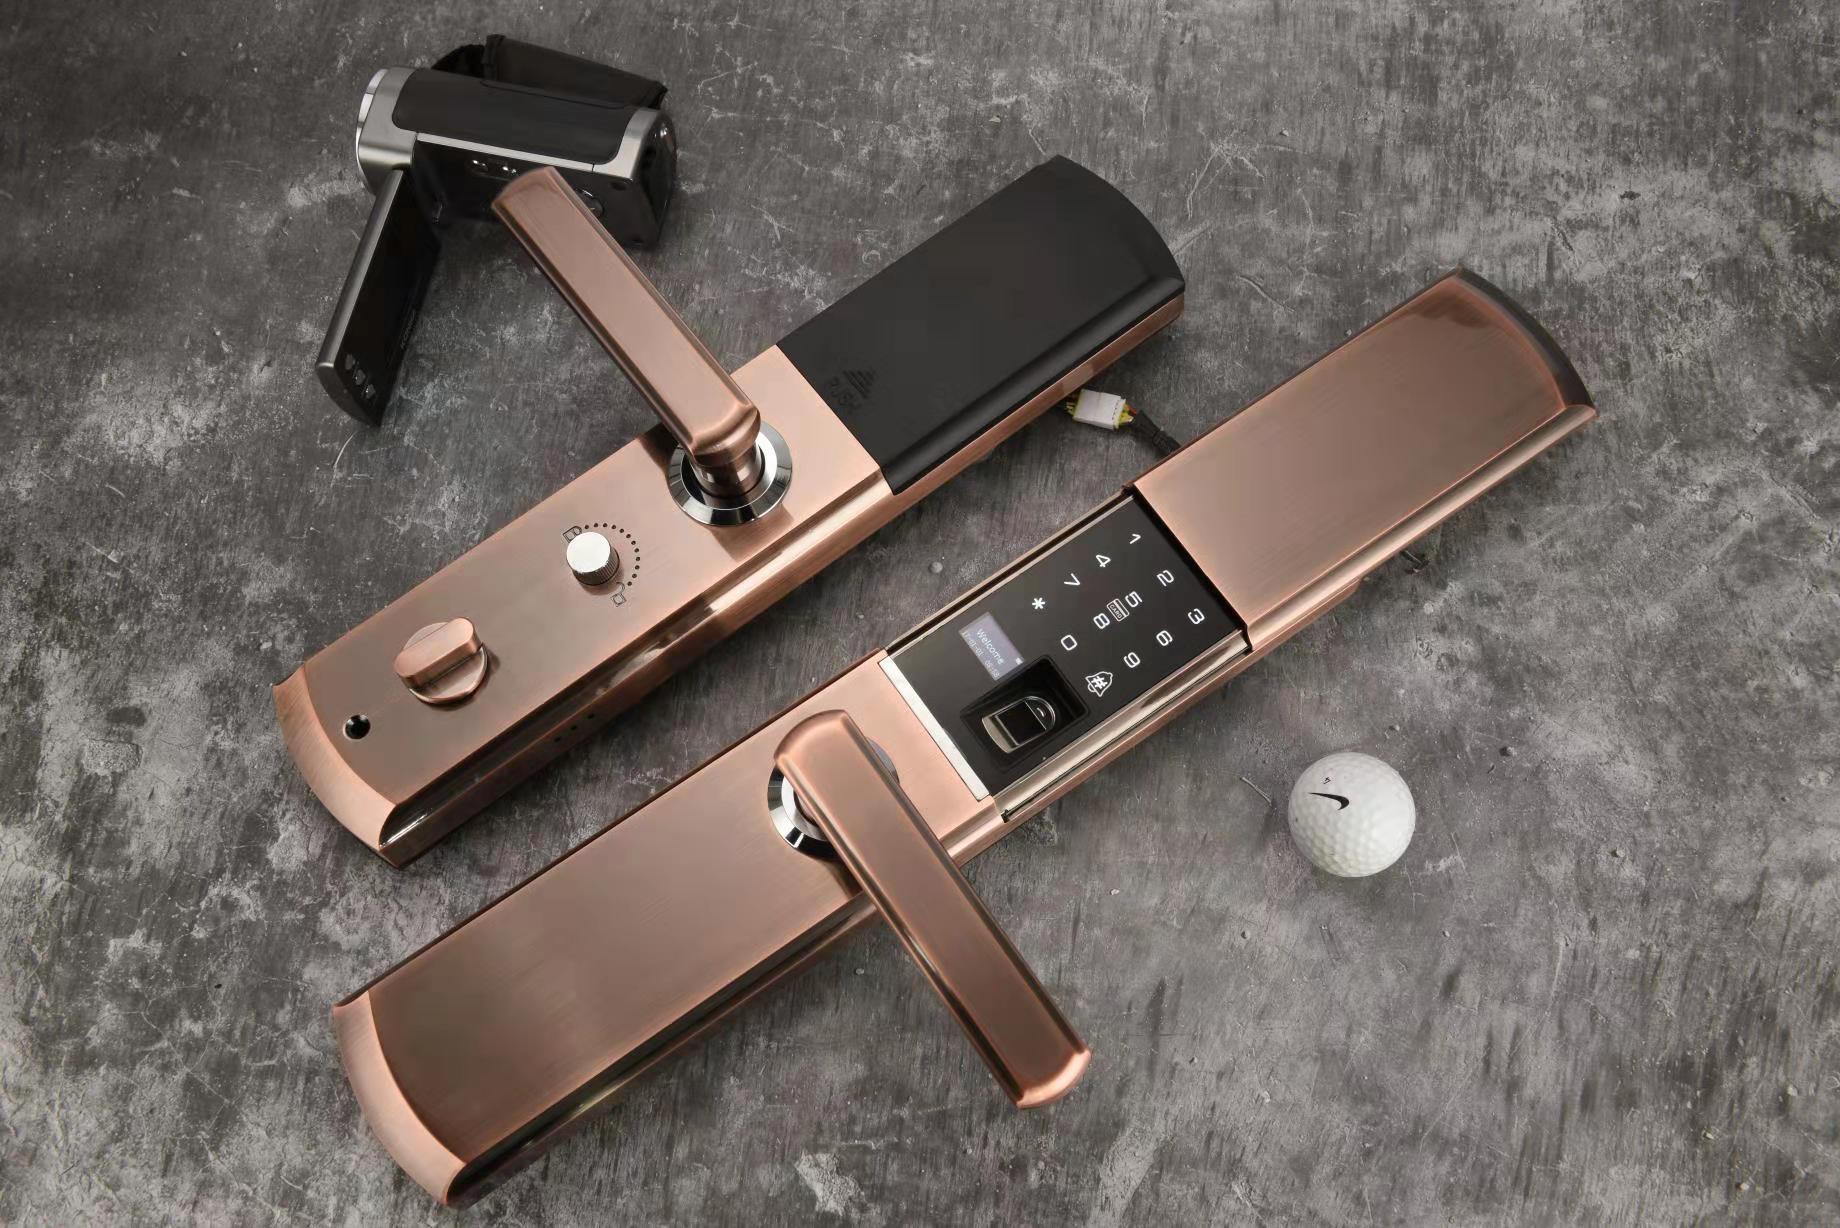 TRJZN智能指纹锁电子门锁密码刷卡手机远程防小黑盒免邮包安装